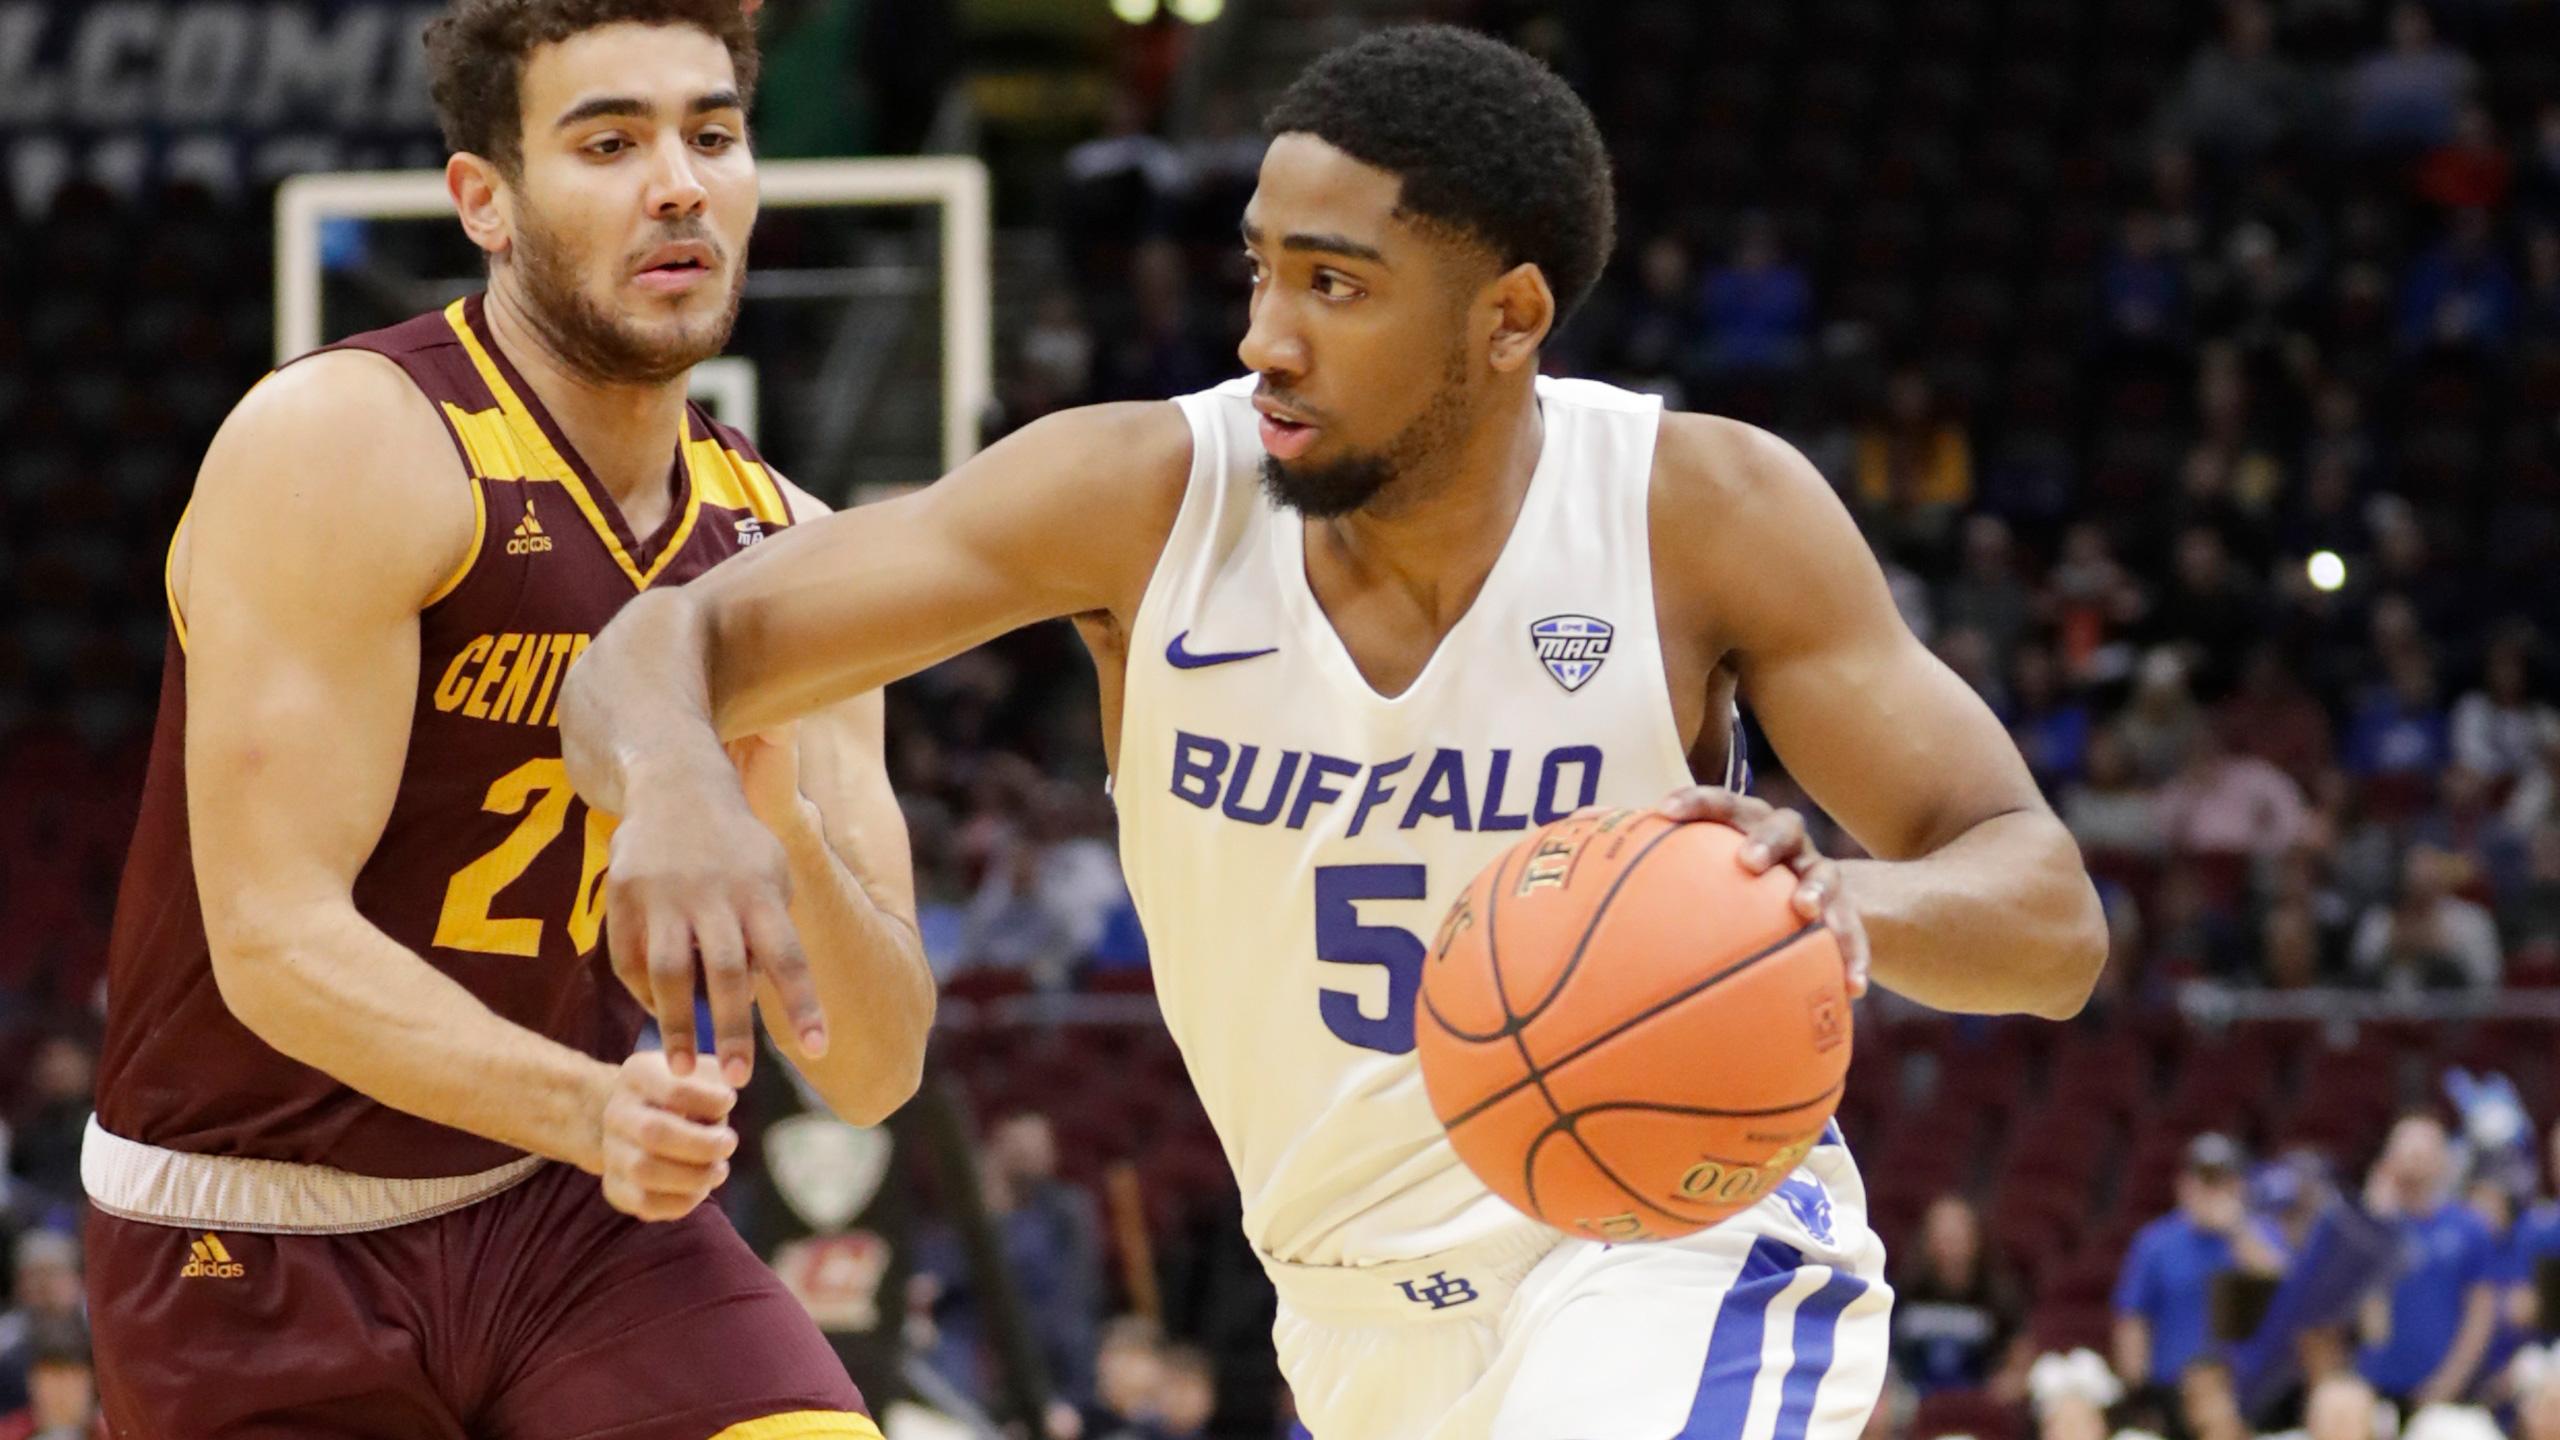 Bowling Green vs. #18 Buffalo (Championship) (MAC Men's Basketball Tournament)